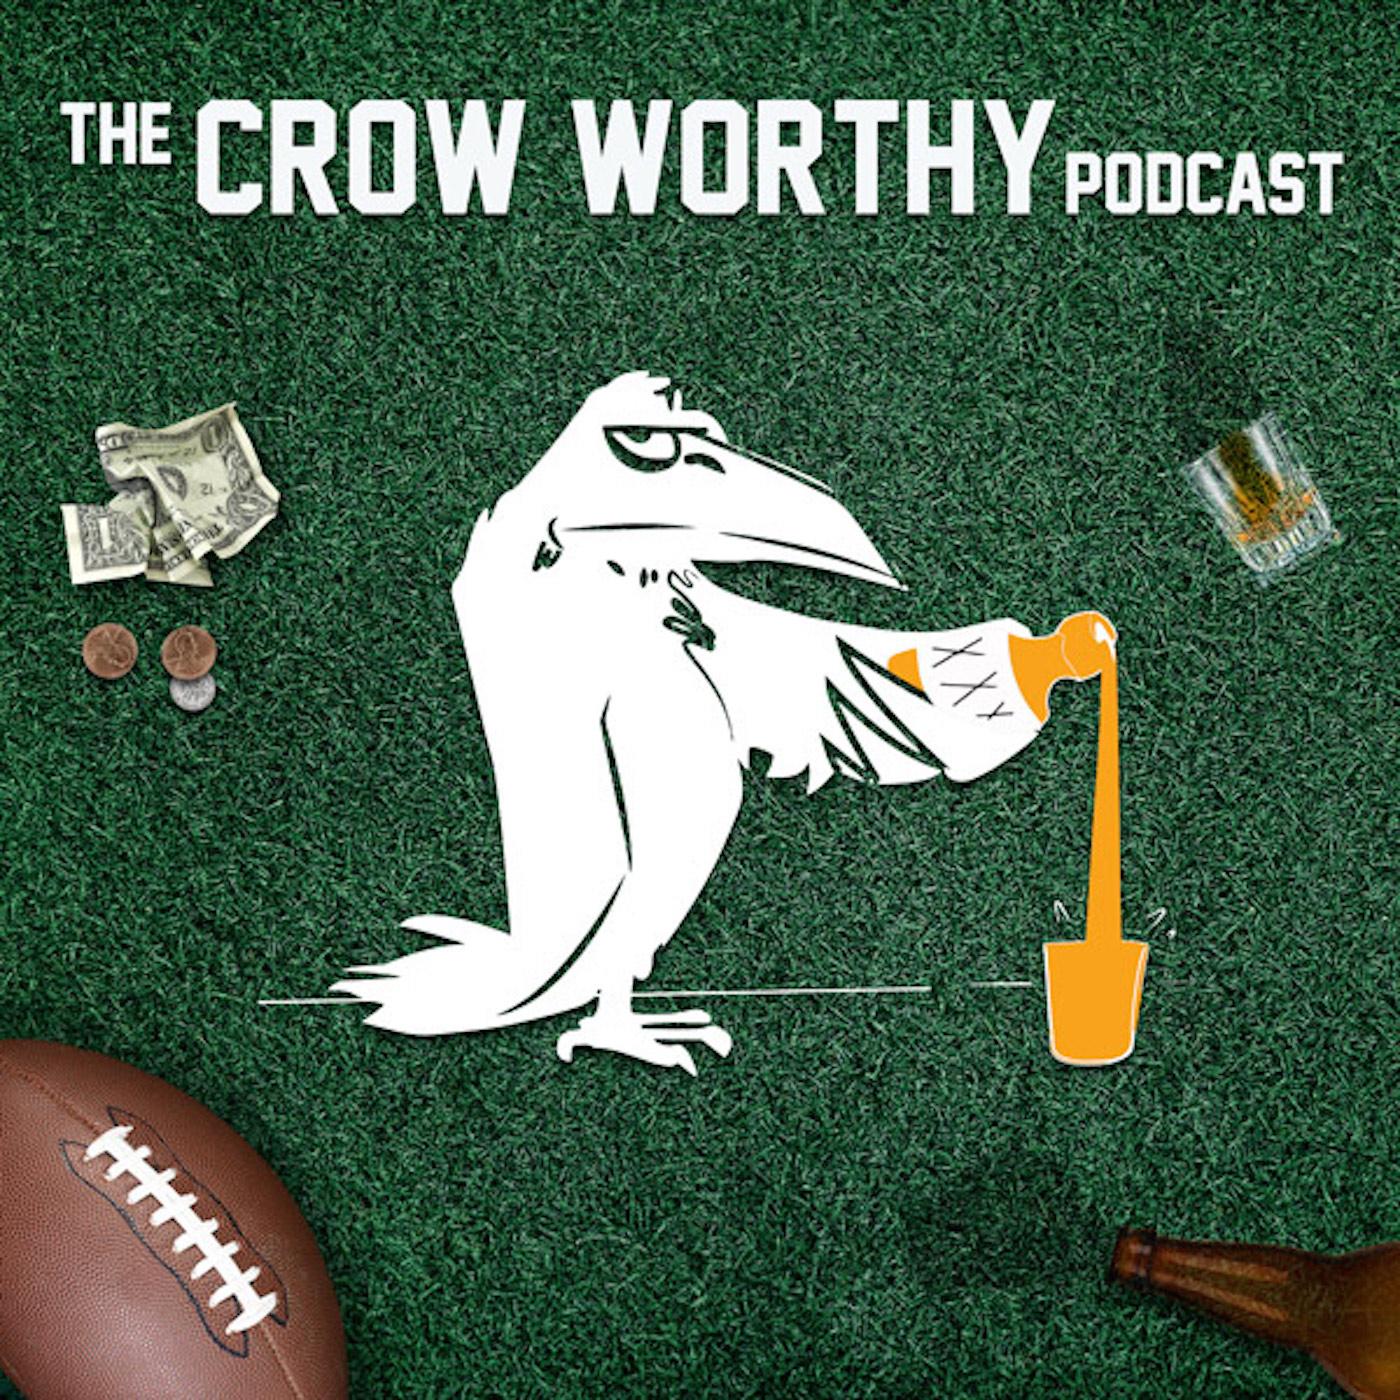 The Crow Worthy Podcast  logo